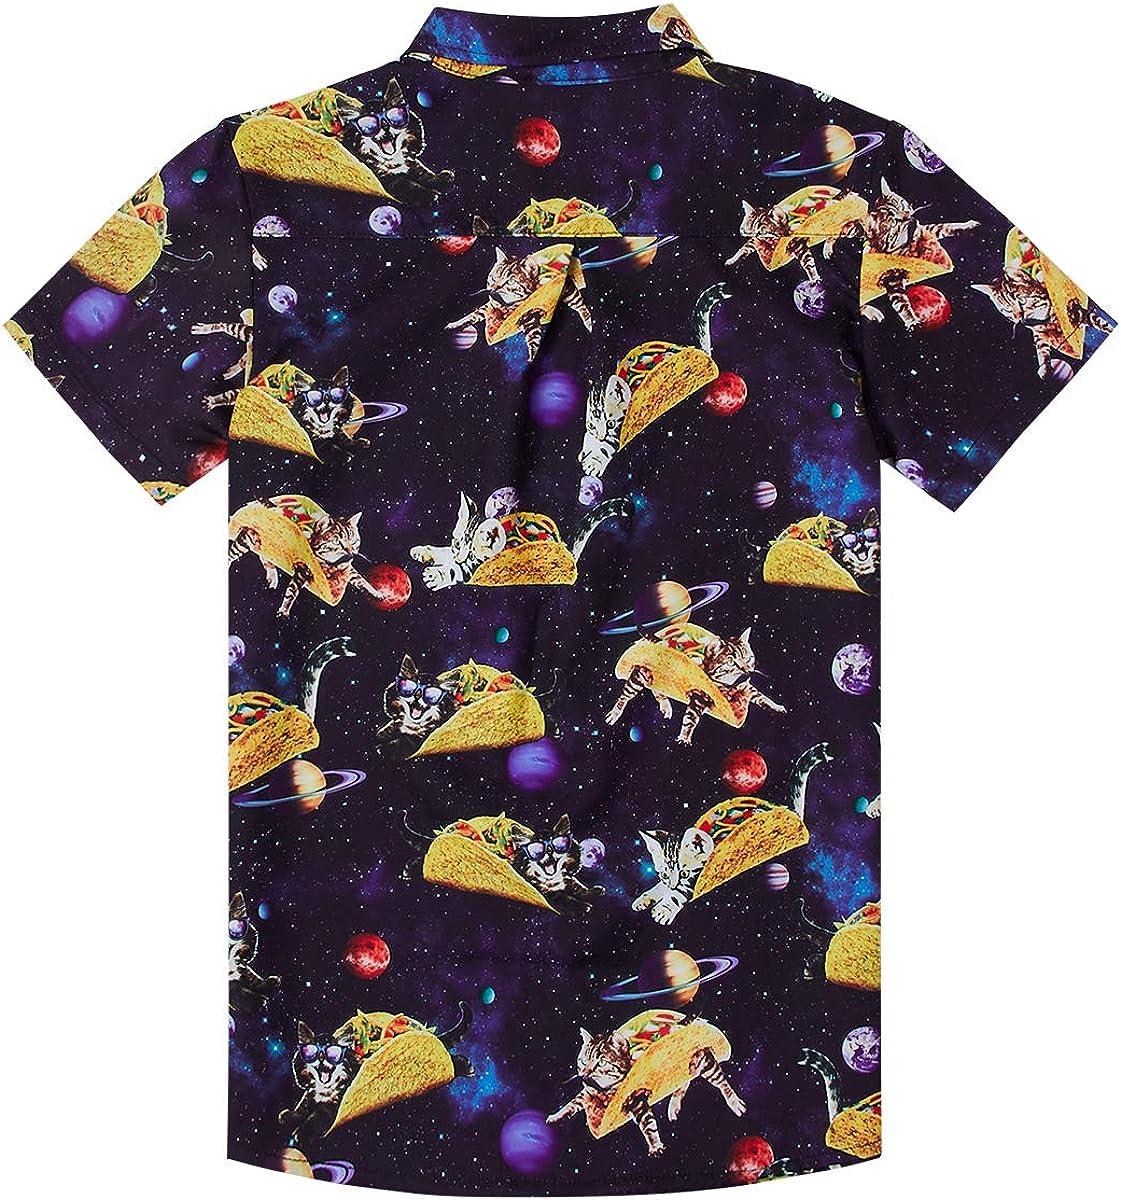 uideazone Boys Free shipping New Hawaiian Shirts Novelty Gorgeous Printed Sleev Short Funky